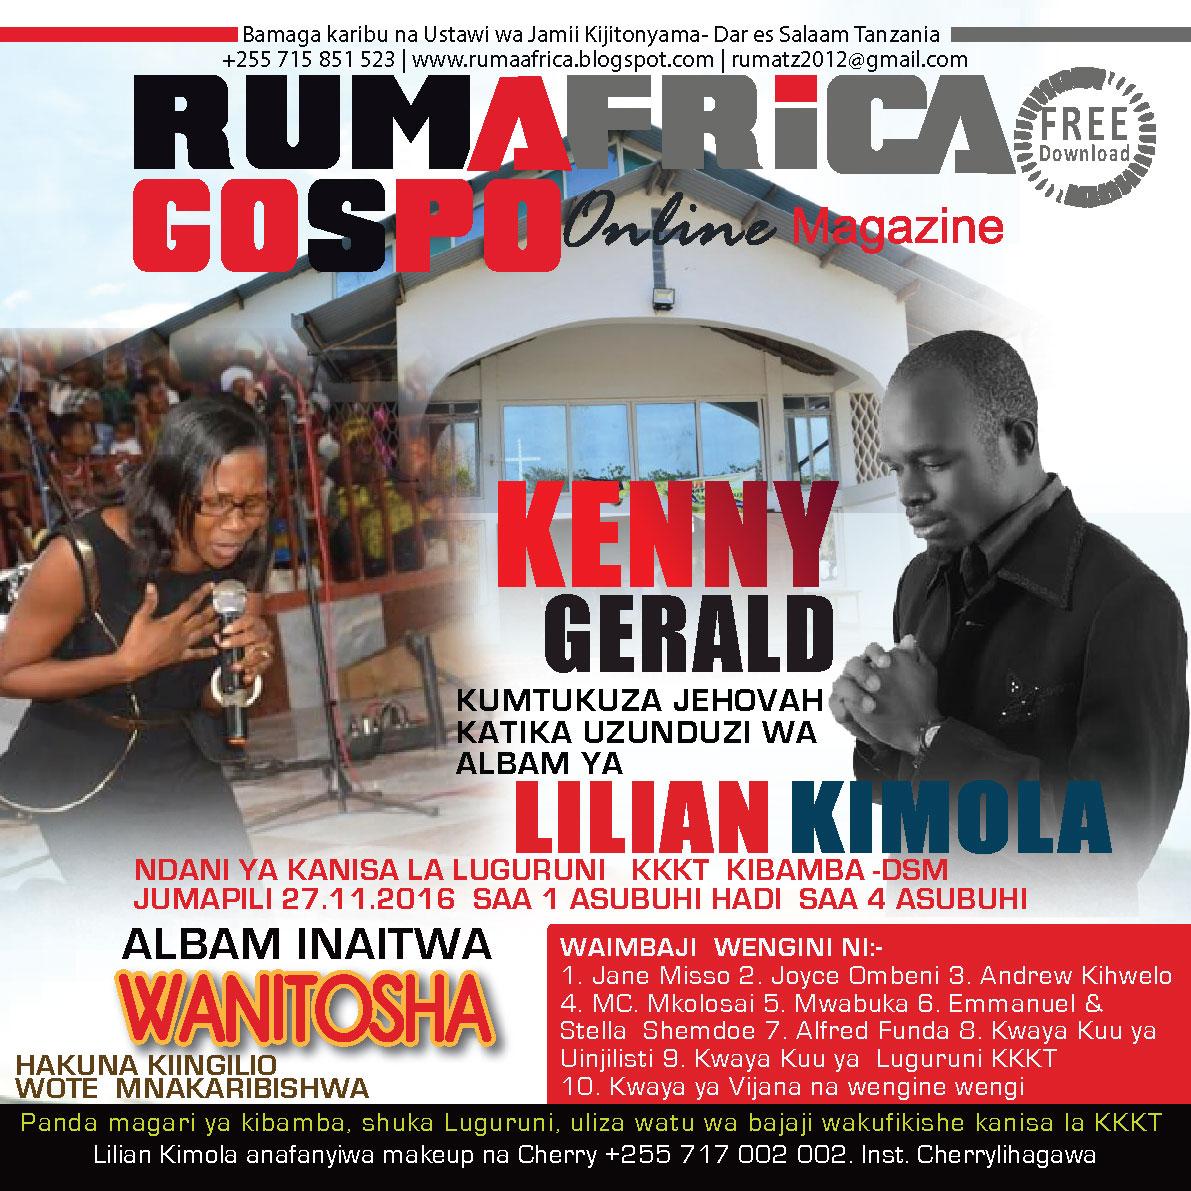 Lilian kimola kuzindua alba yake leo jumapili Internet magasin